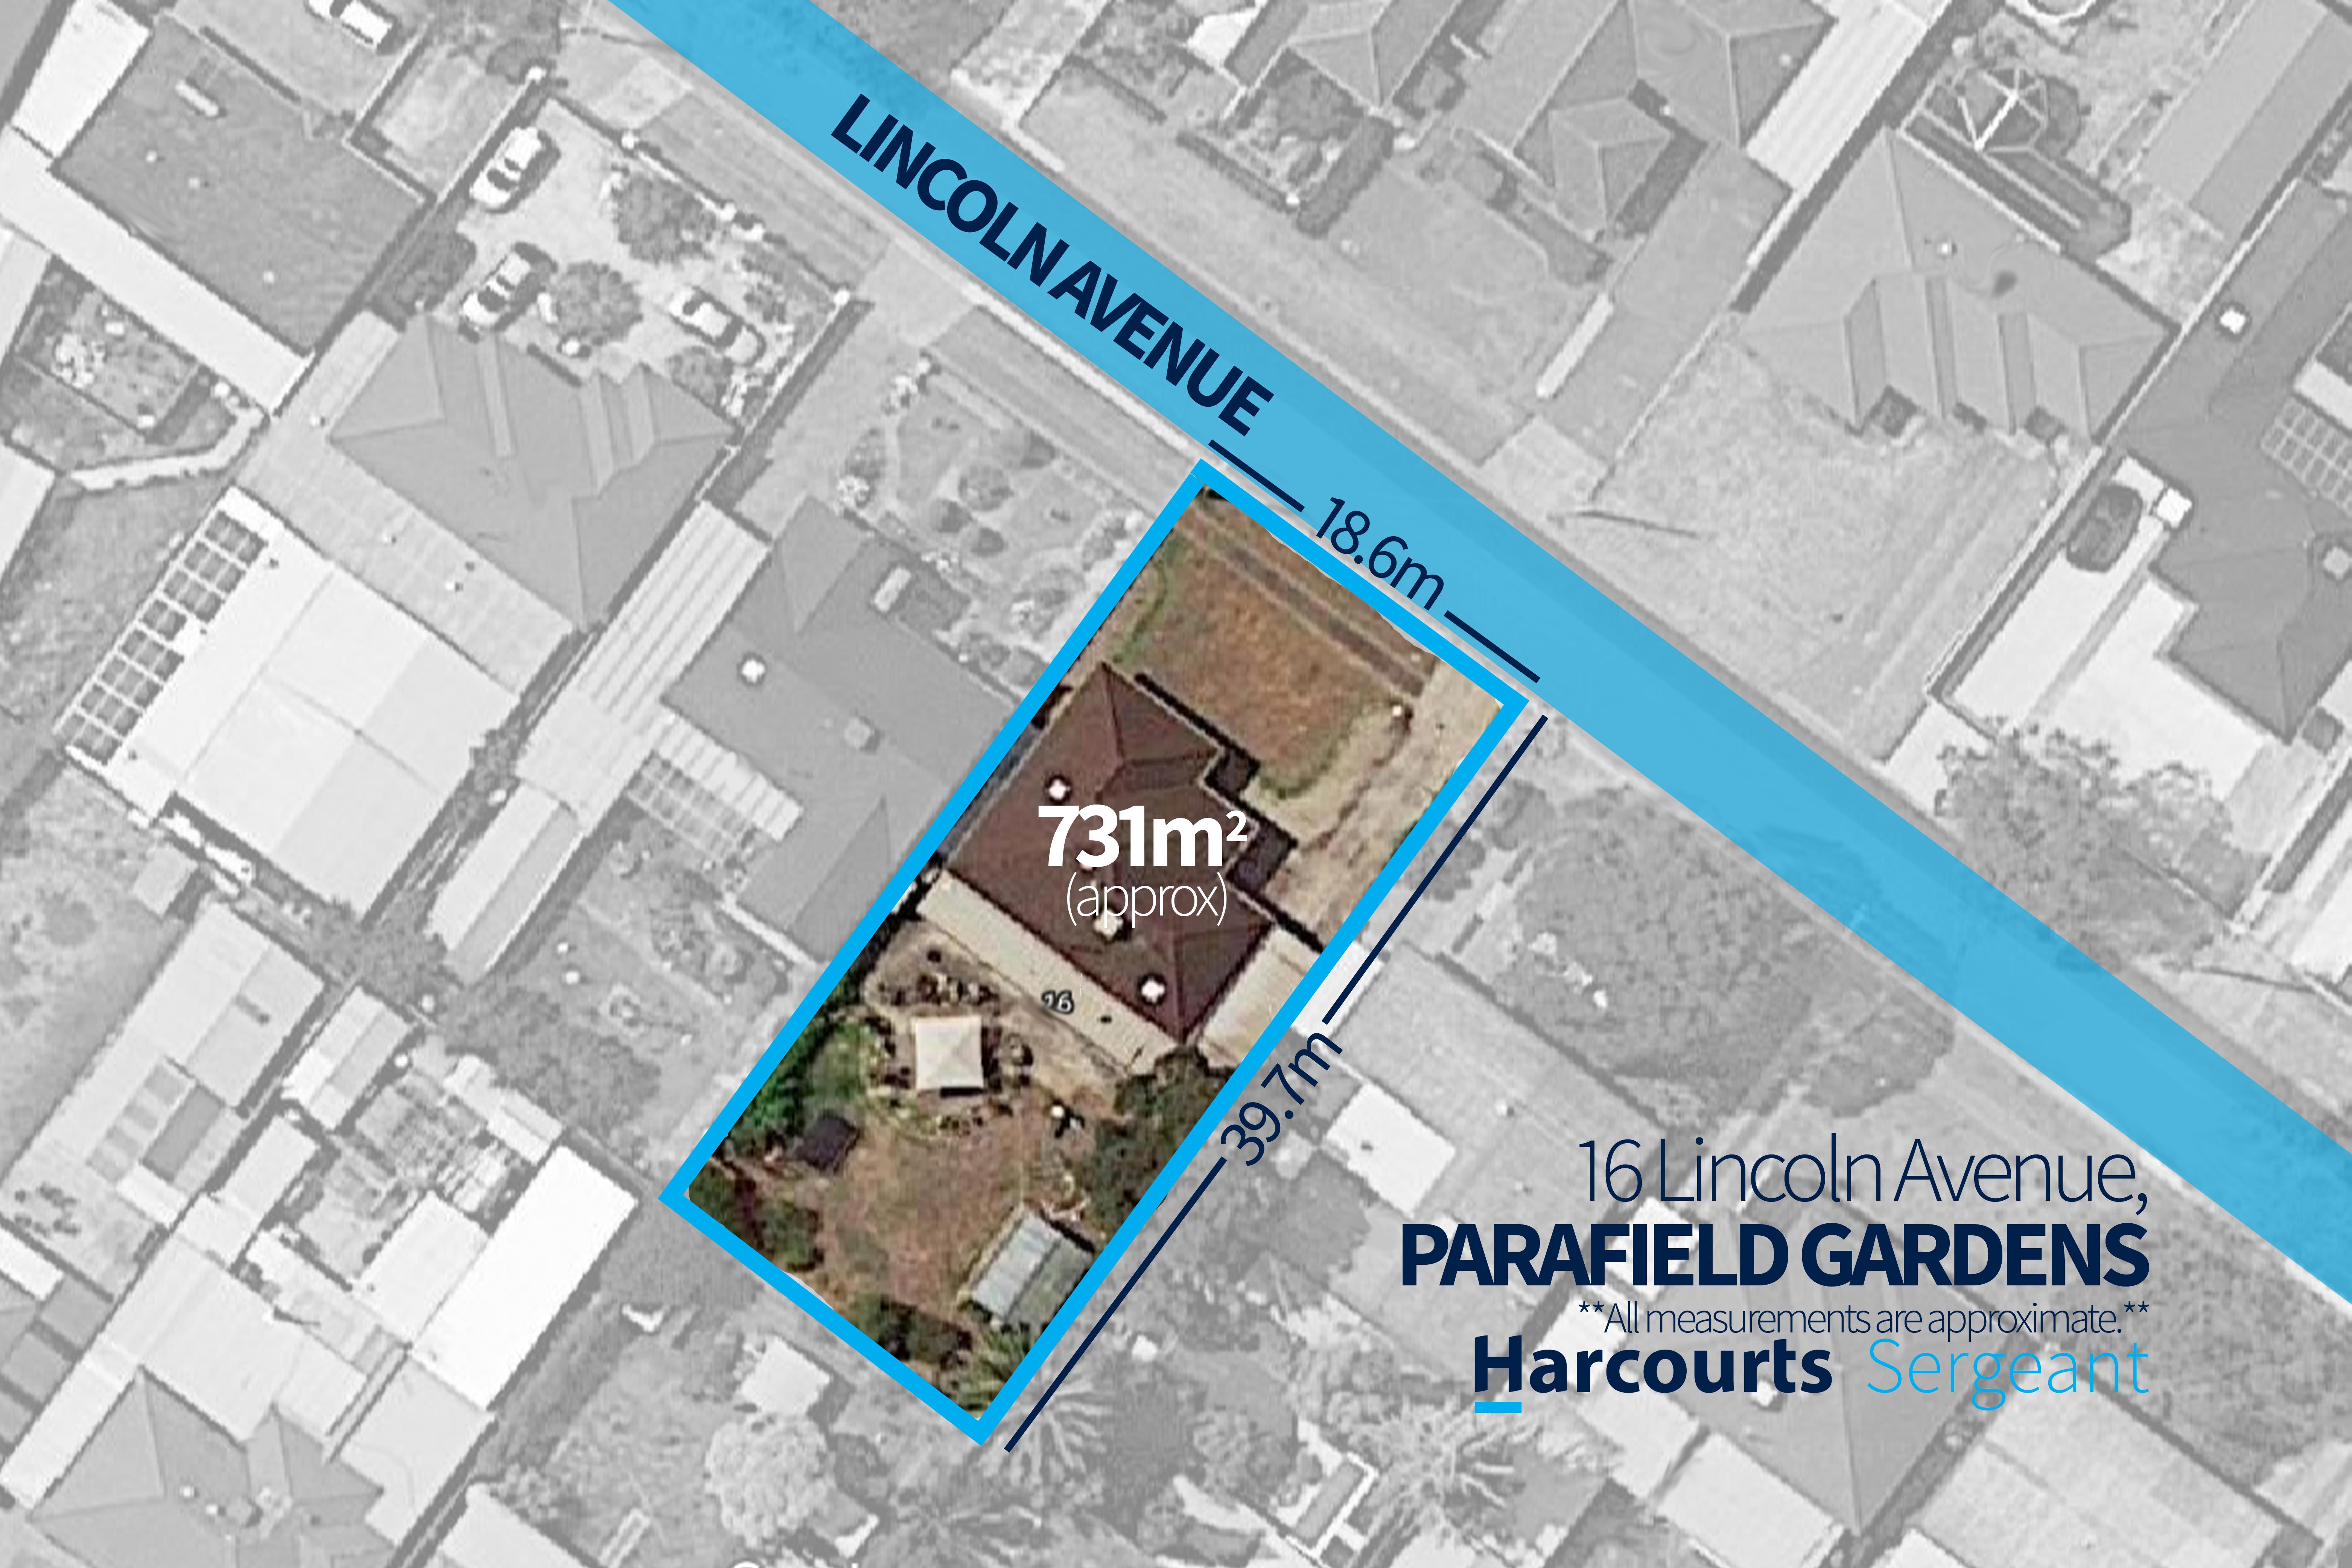 02 - 16 Lincoln Avenue, Parafield Garden